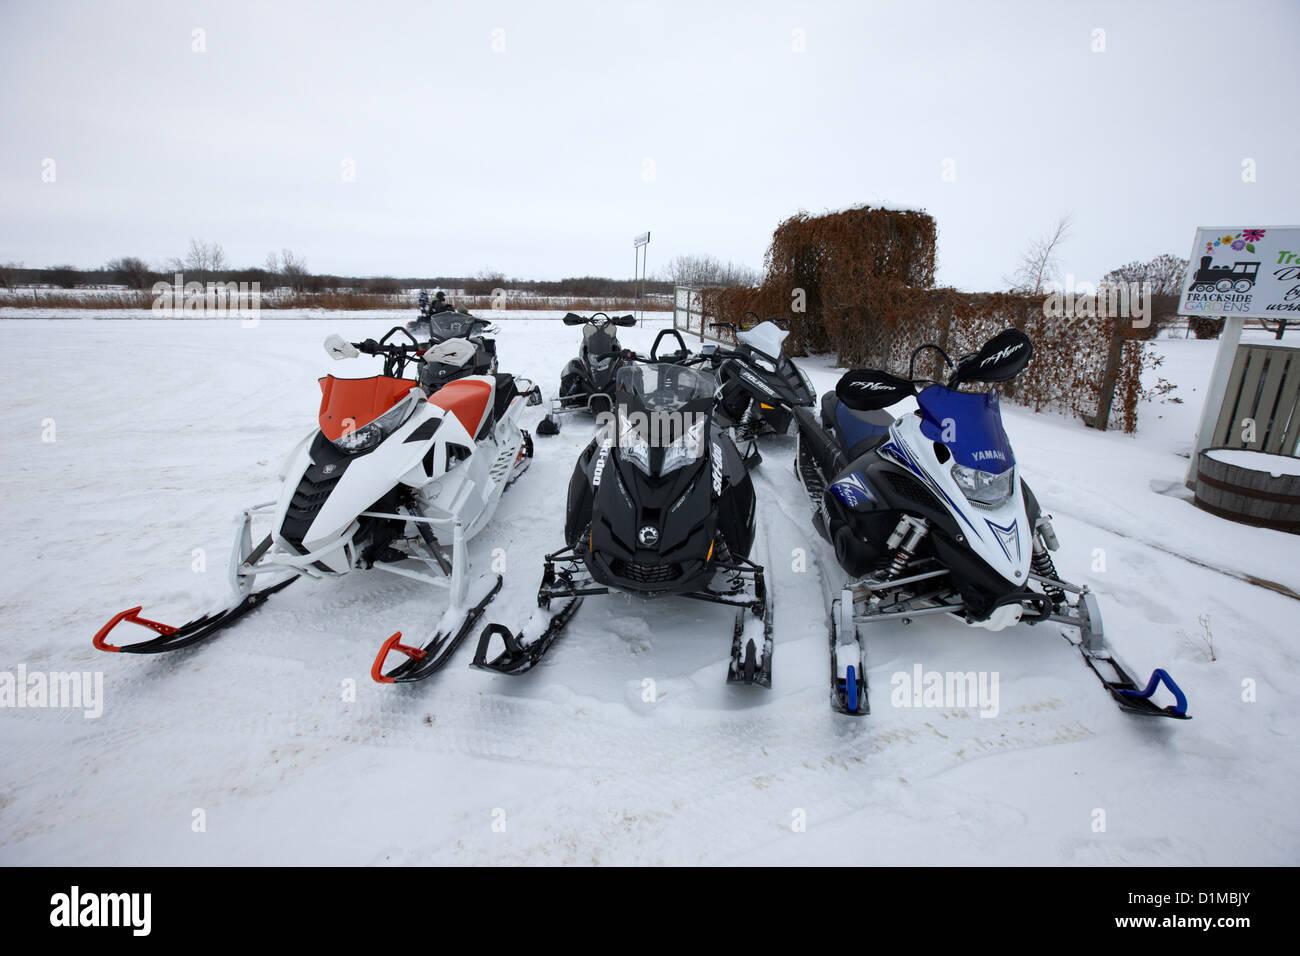 snowmobiles parked in Kamsack Saskatchewan Canada - Stock Image